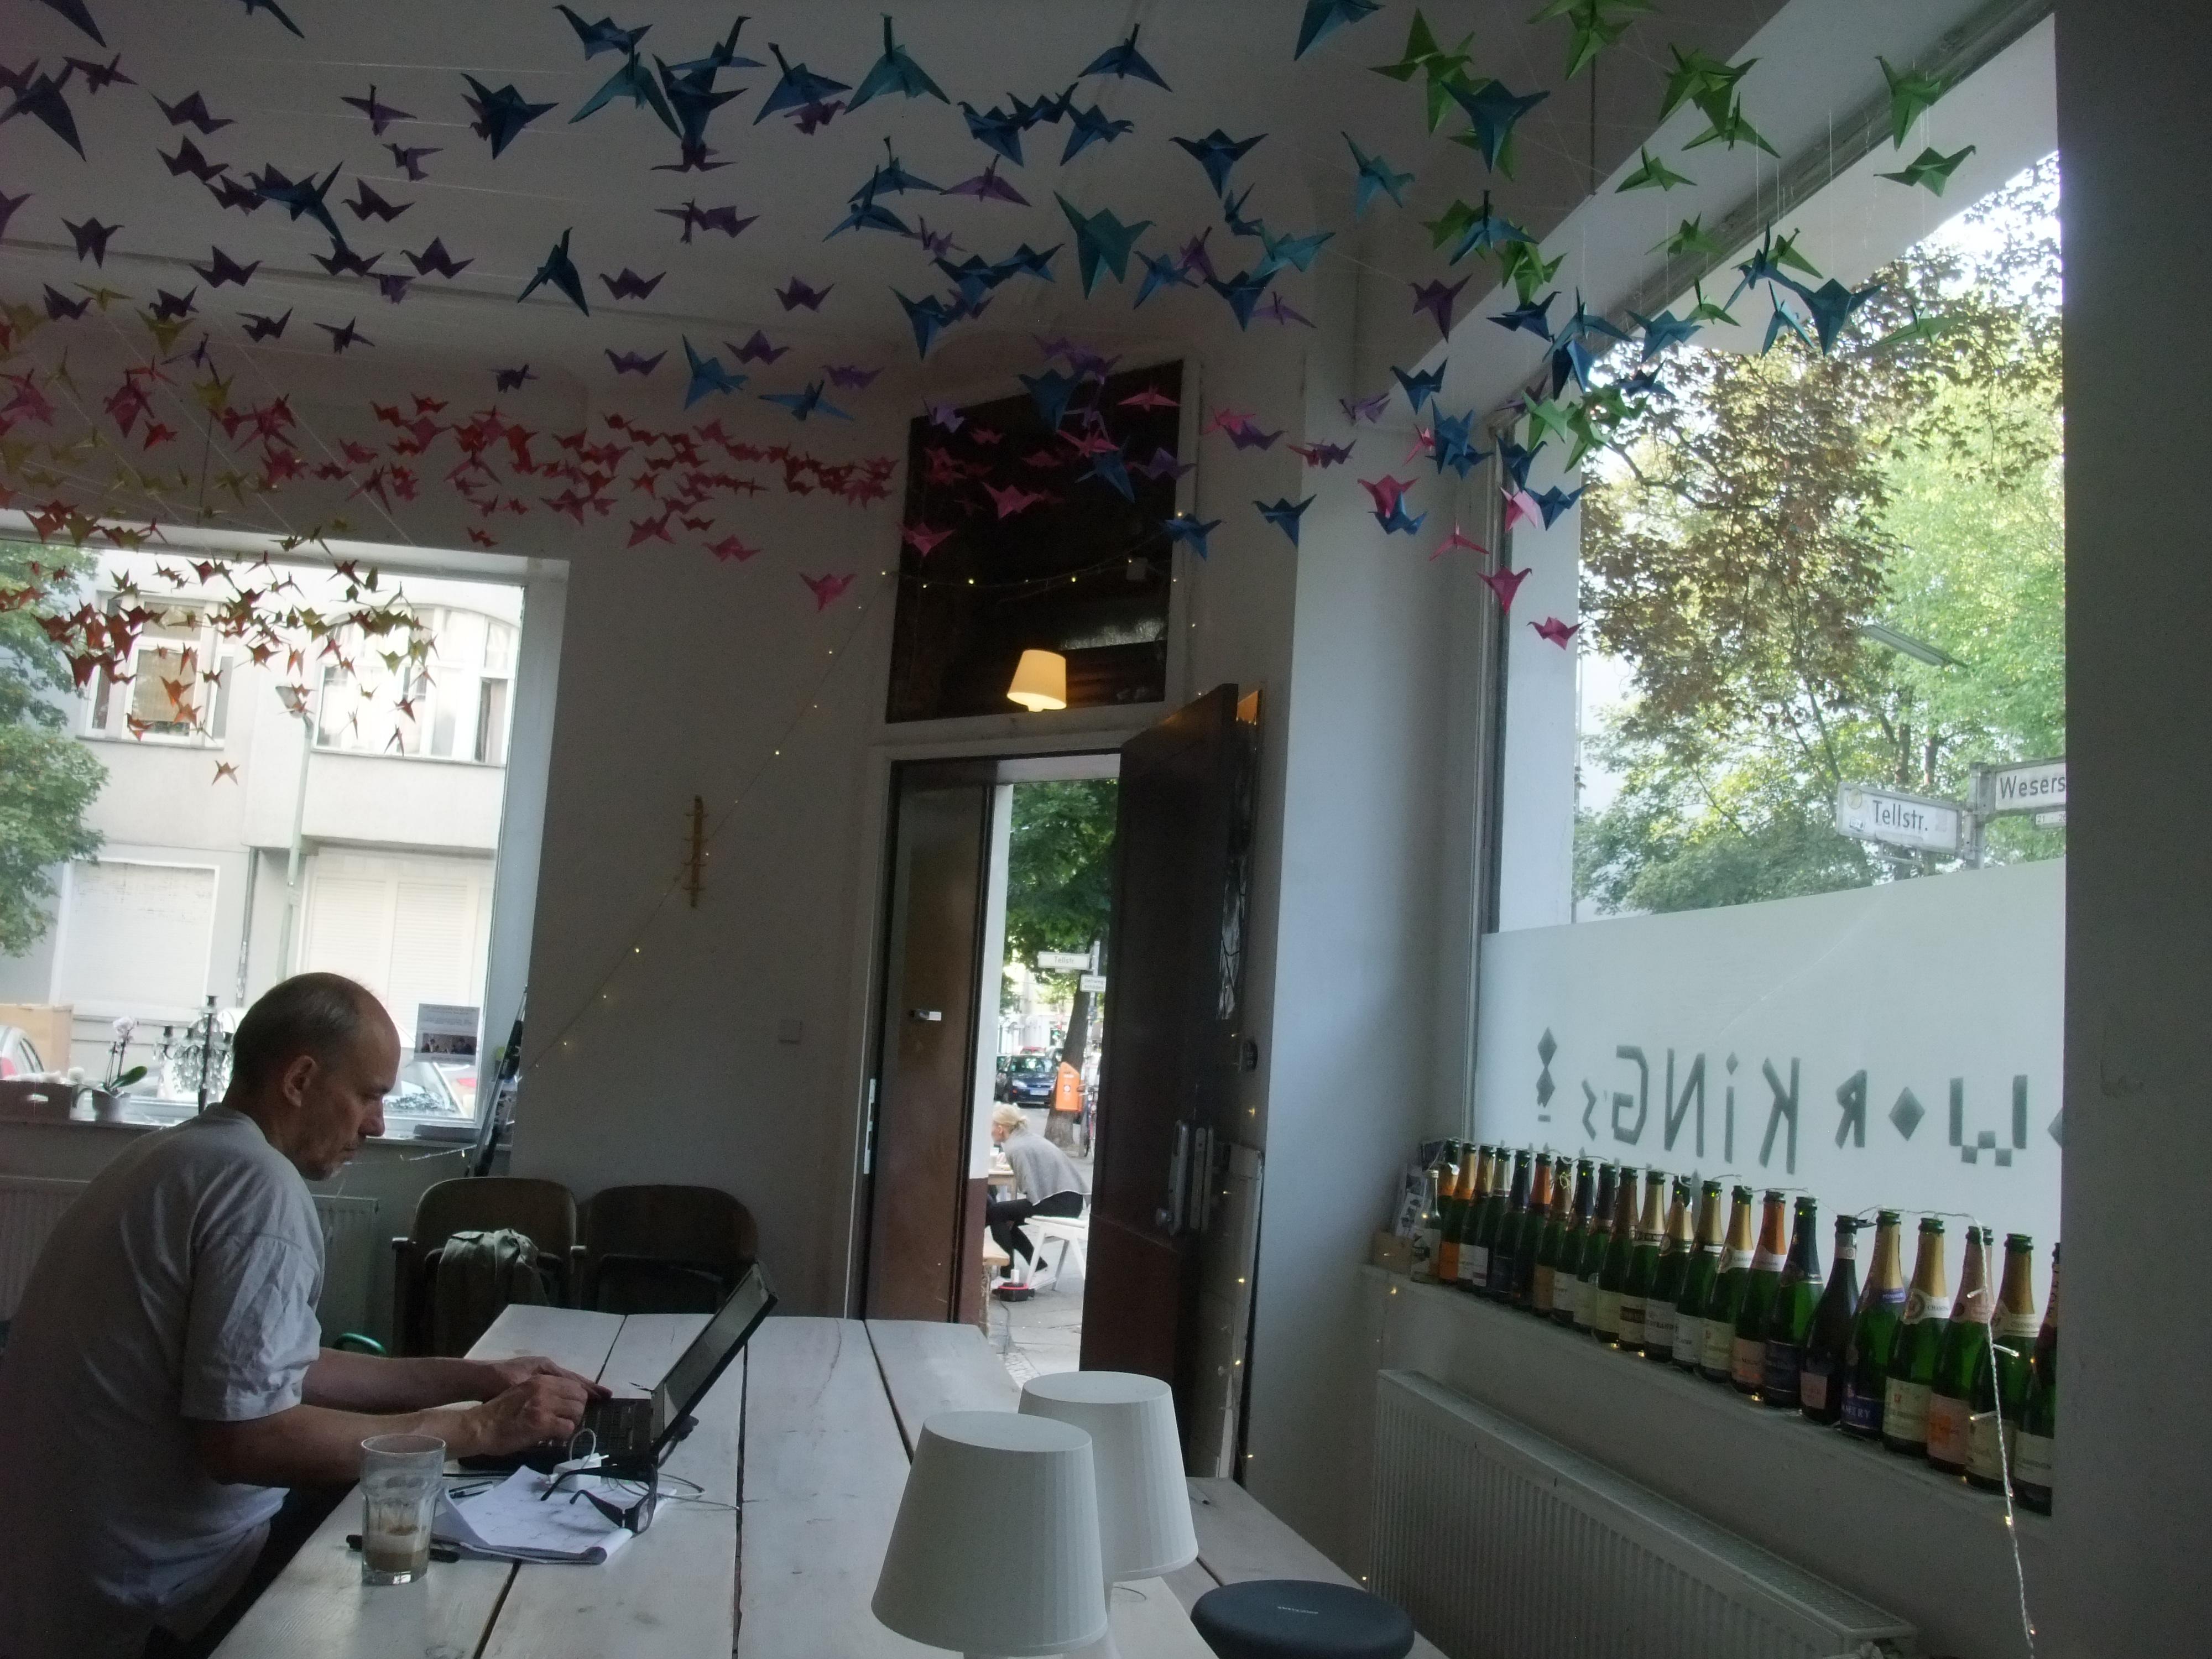 luxus interieur design idee sennhutte im gebirge, august | 2014 | stefan mesch, Design ideen